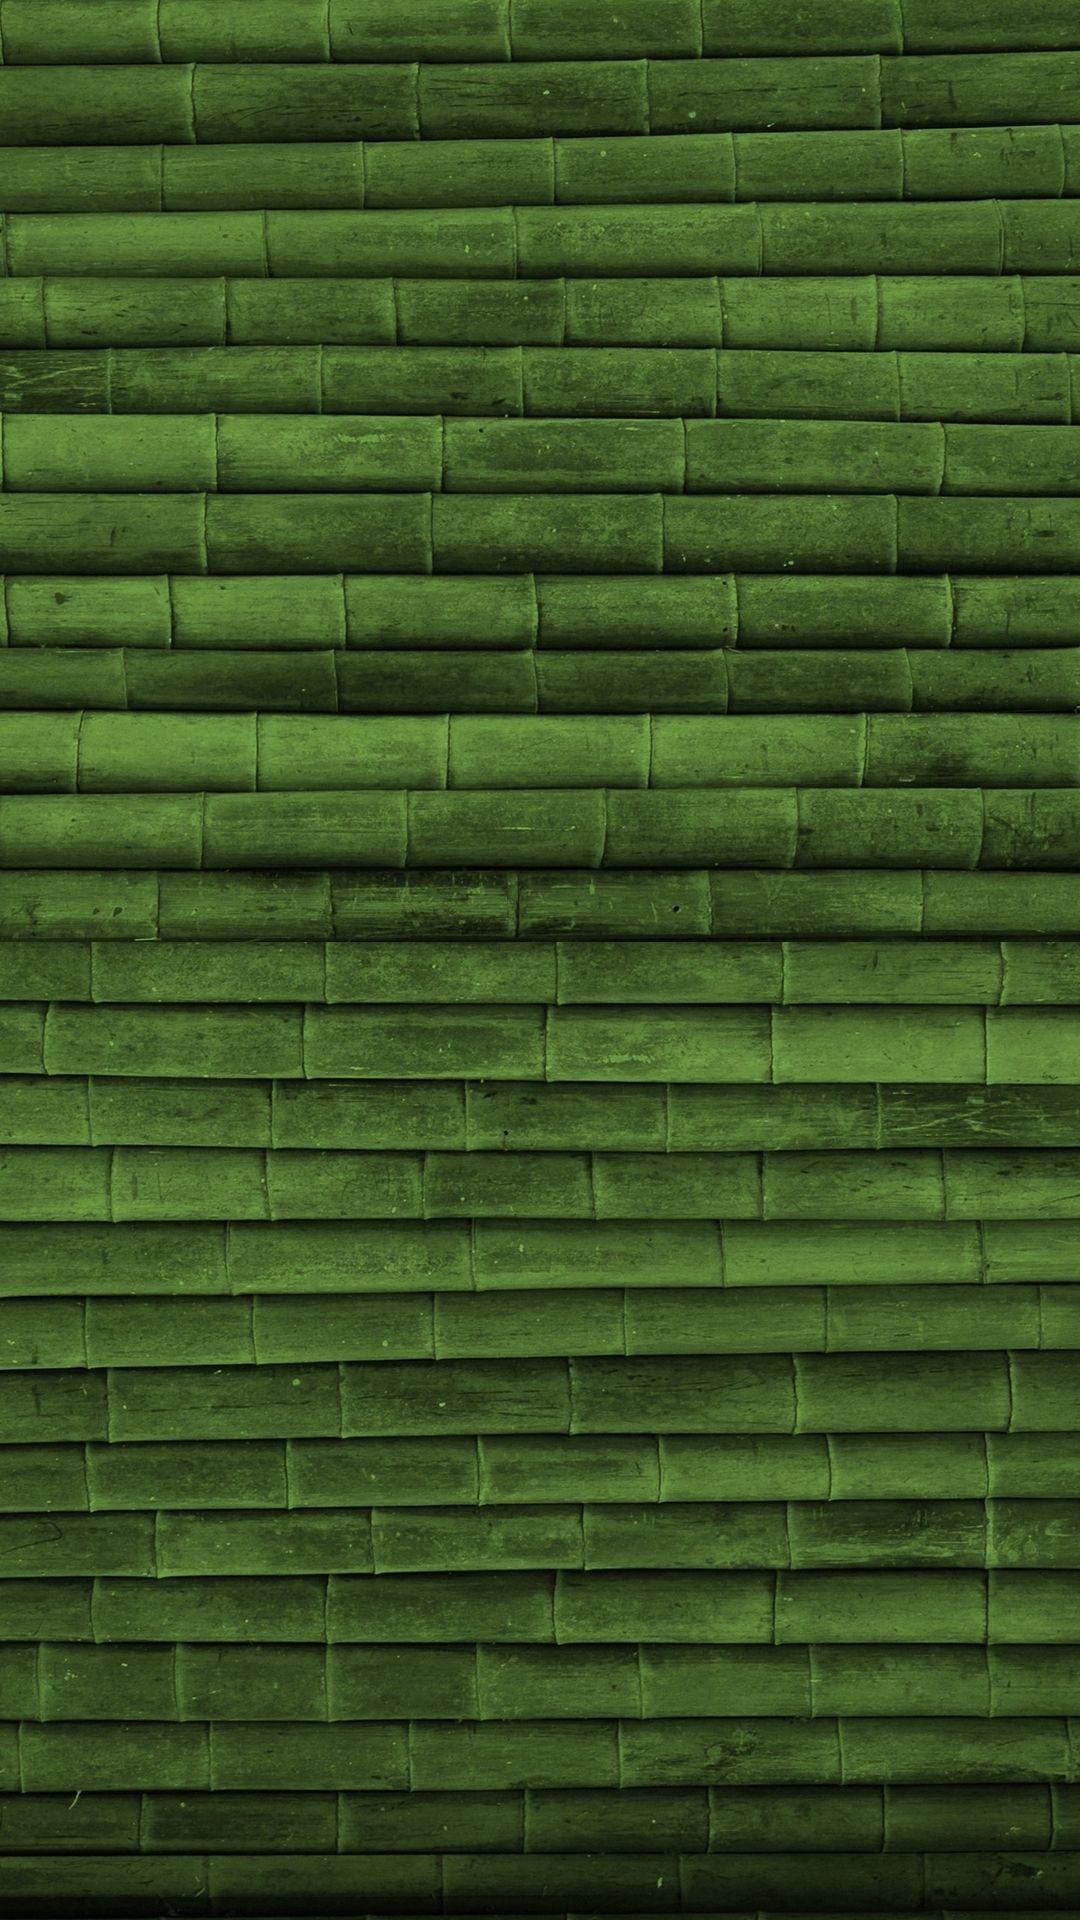 1080 1920 Hd Wallpapers For Mobile Phone Sony Lg Htc Motorola Samsung Free Phone Wallpapers For Mobile C In 2020 Green Aesthetic Dark Green Wallpaper Green Wallpaper